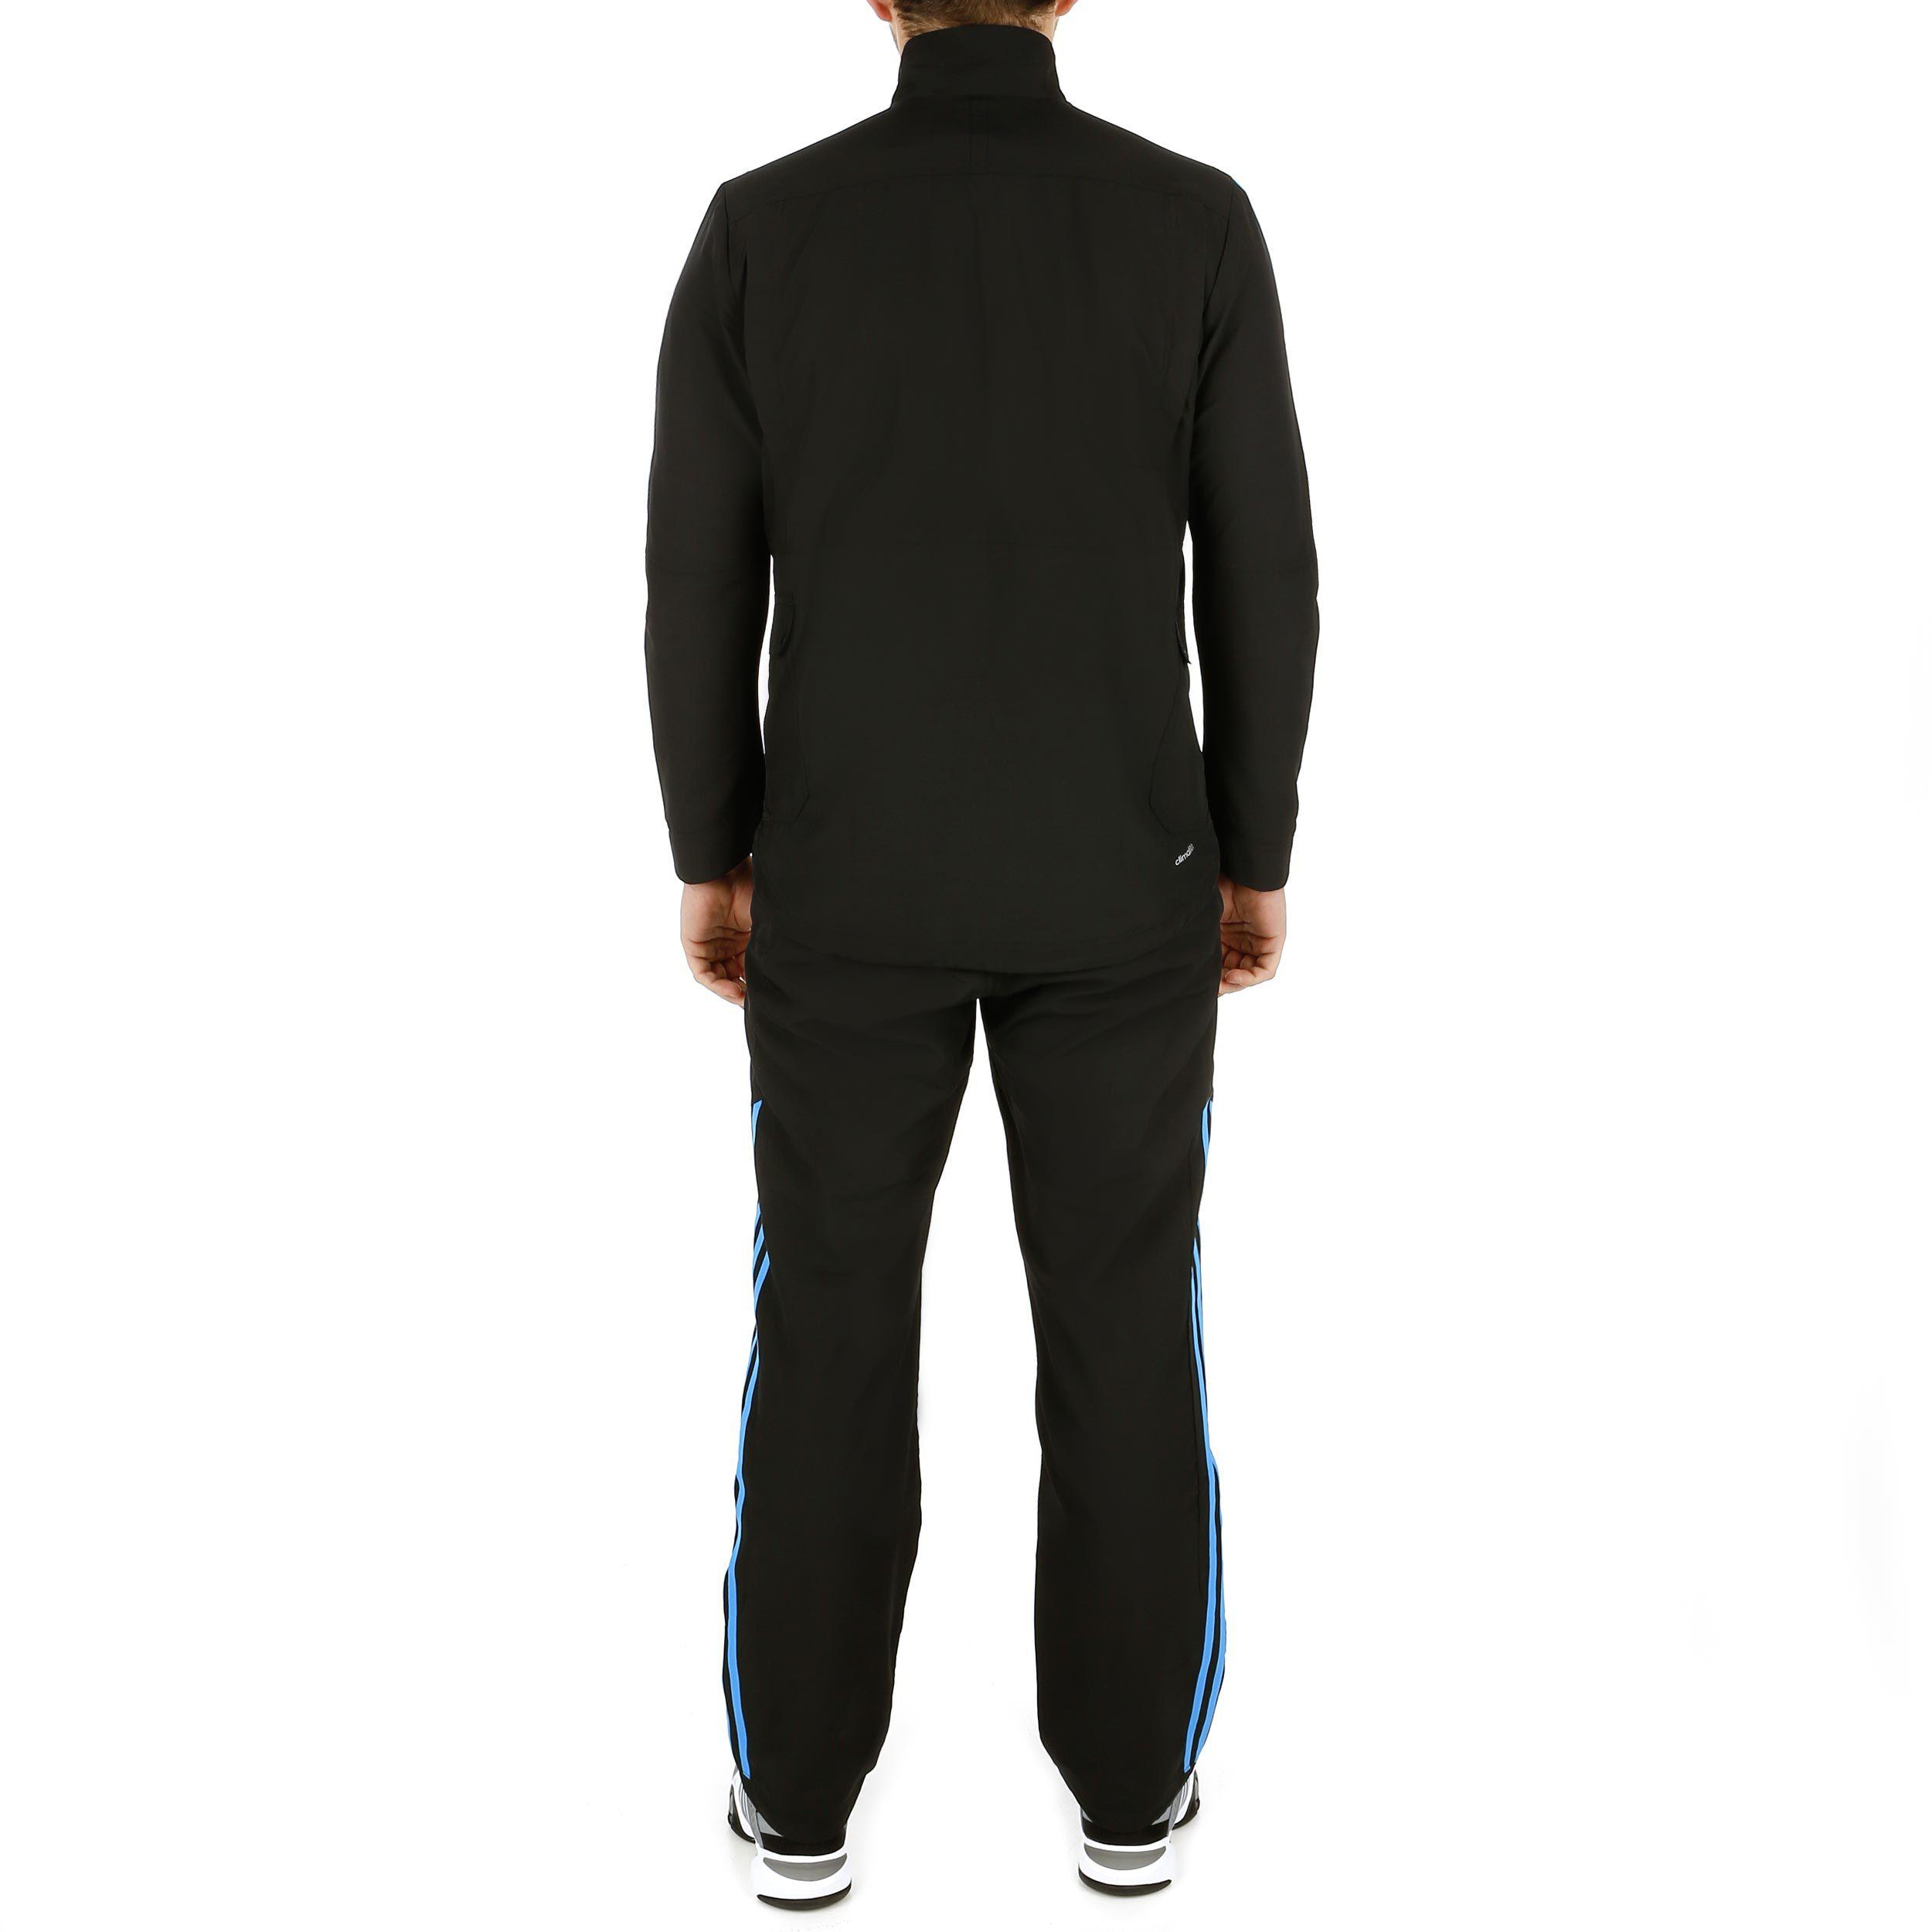 adidas Clima365 Woven Trainingsanzug Herren Schwarz